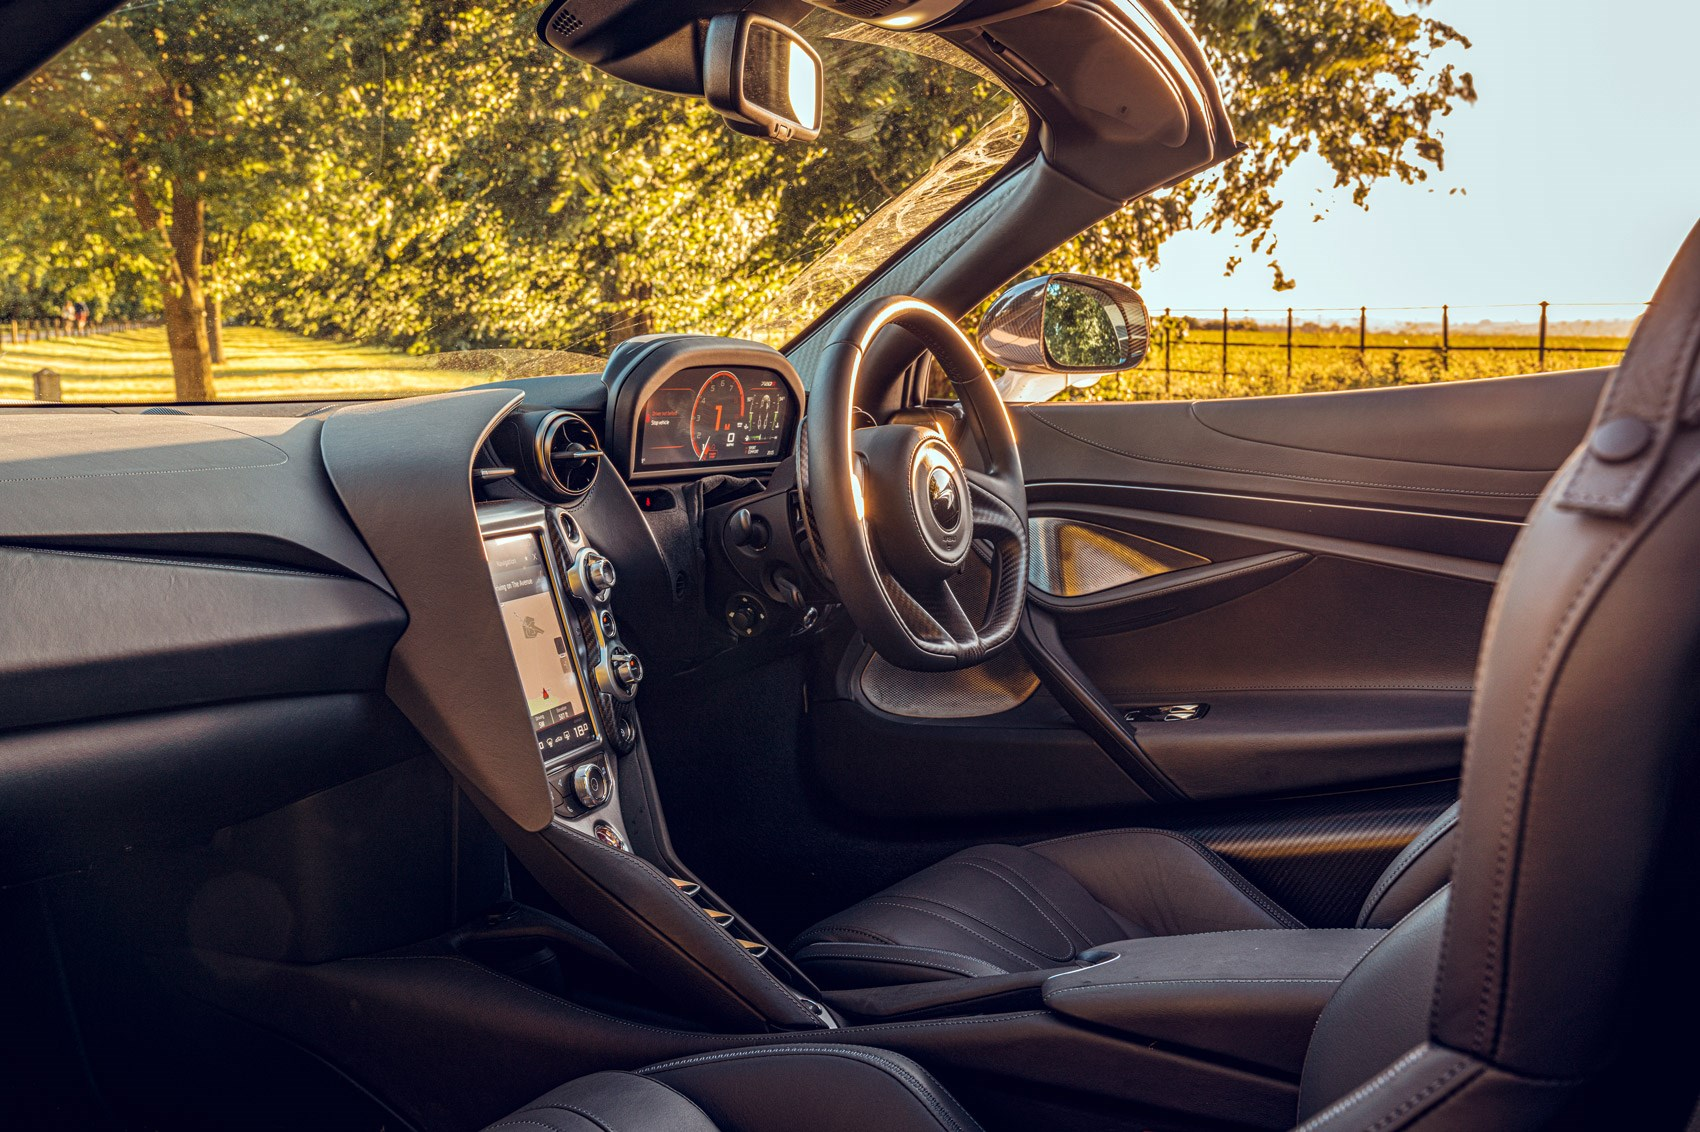 Ferrari F8 Spider Vs Mclaren 720s Spider Twin Test 2020 Review Car Magazine